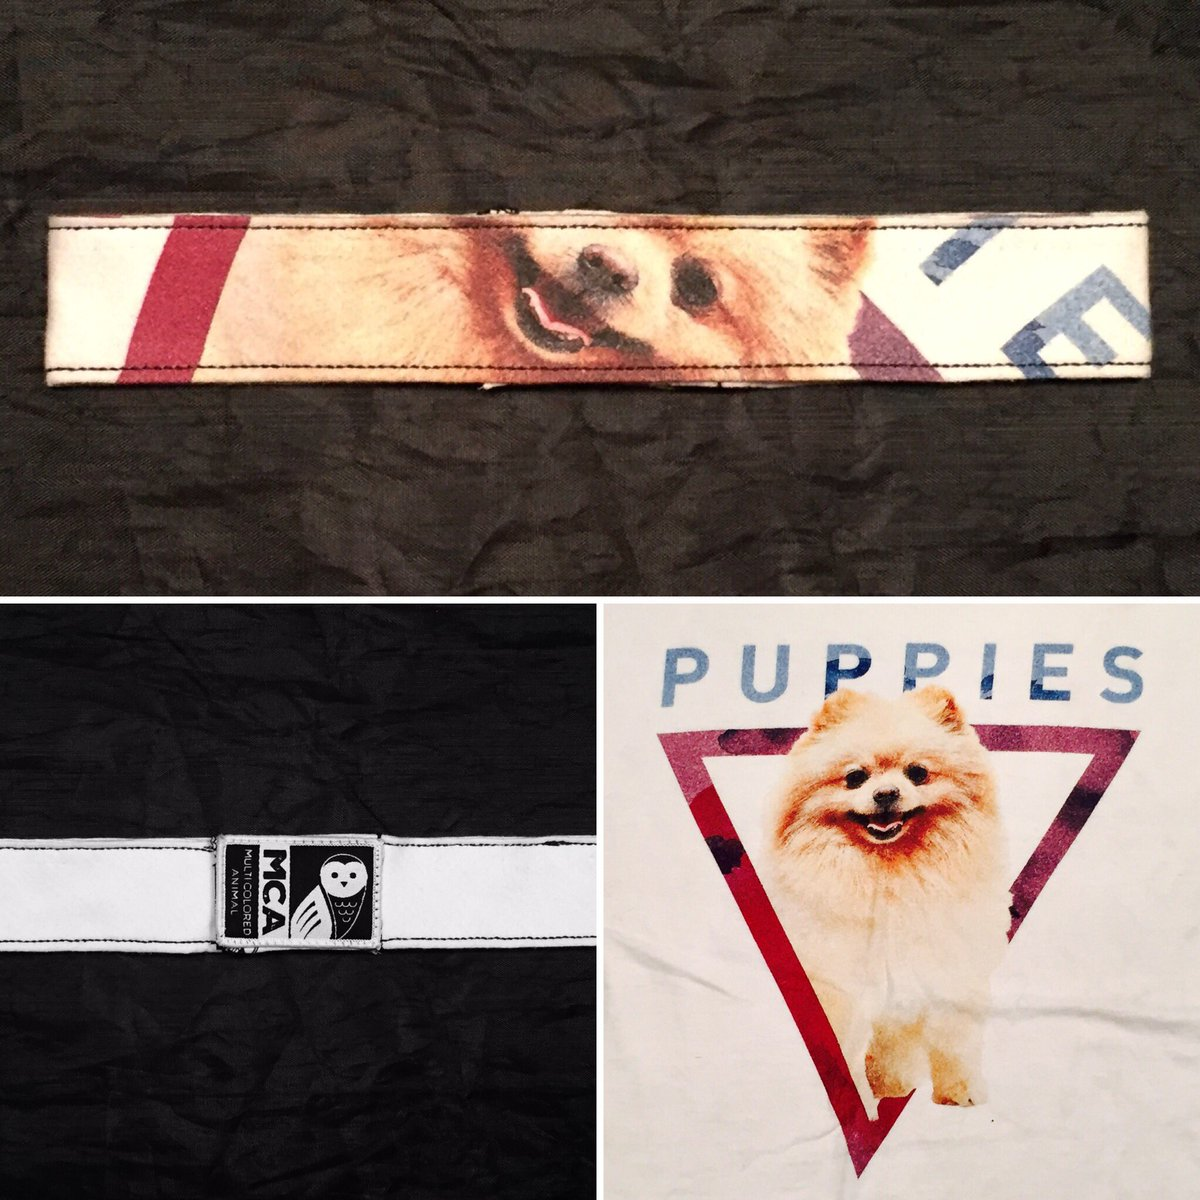 #Oneofakind #Puppies #headband #repurposed from #tshirt  http://www. MCAHeadbands.com  &nbsp;   @PHXFashionWeek @PuppiesMMHappy #phxfw #fashion #headbands<br>http://pic.twitter.com/pPqTUAoddC